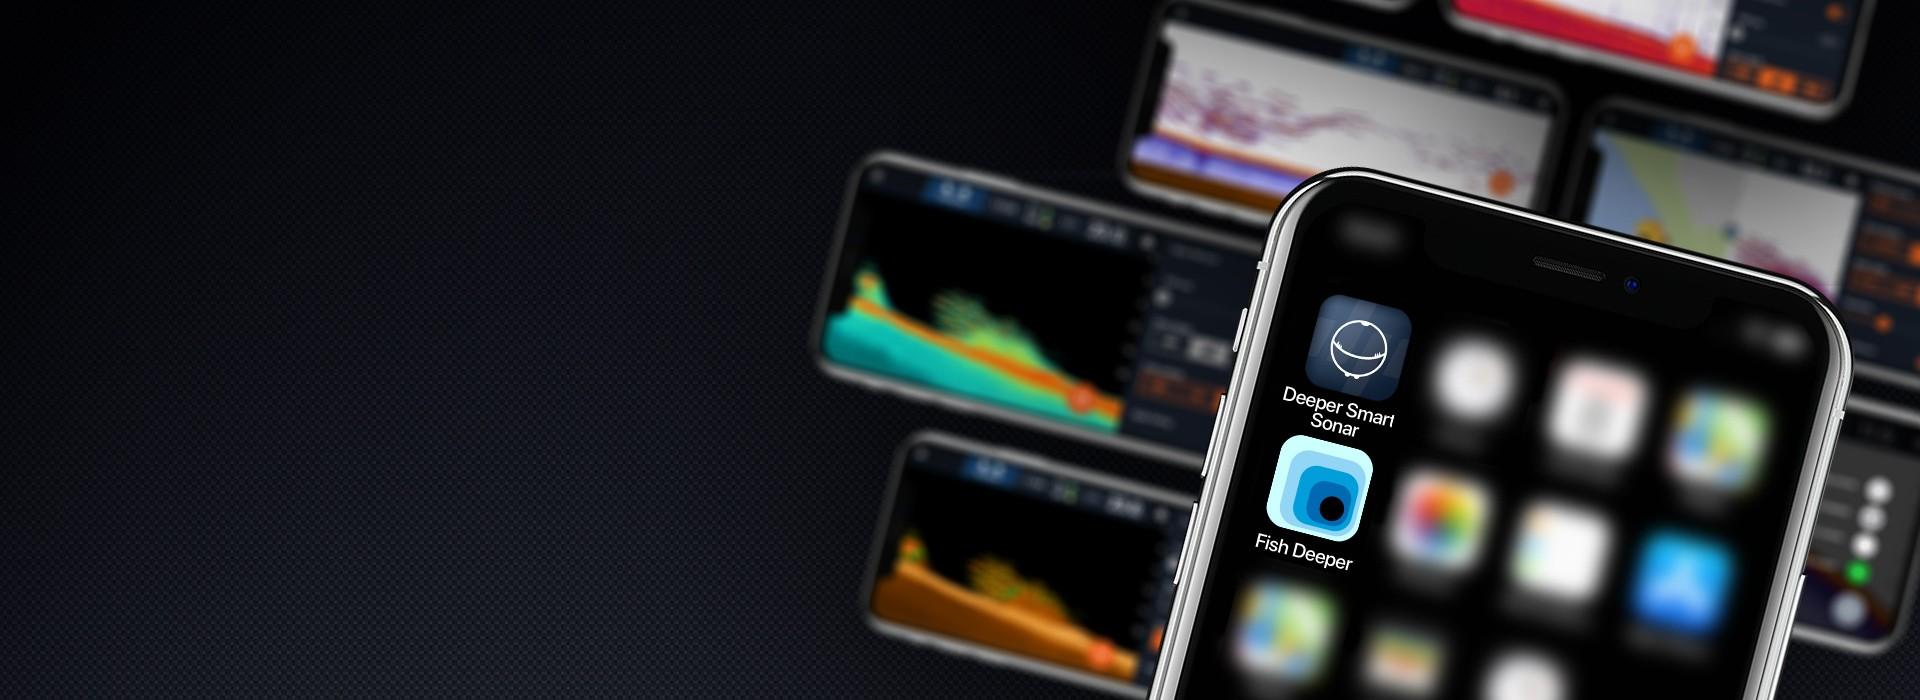 Deeper 앱2개의 앱. 다양한 낚시 가능성